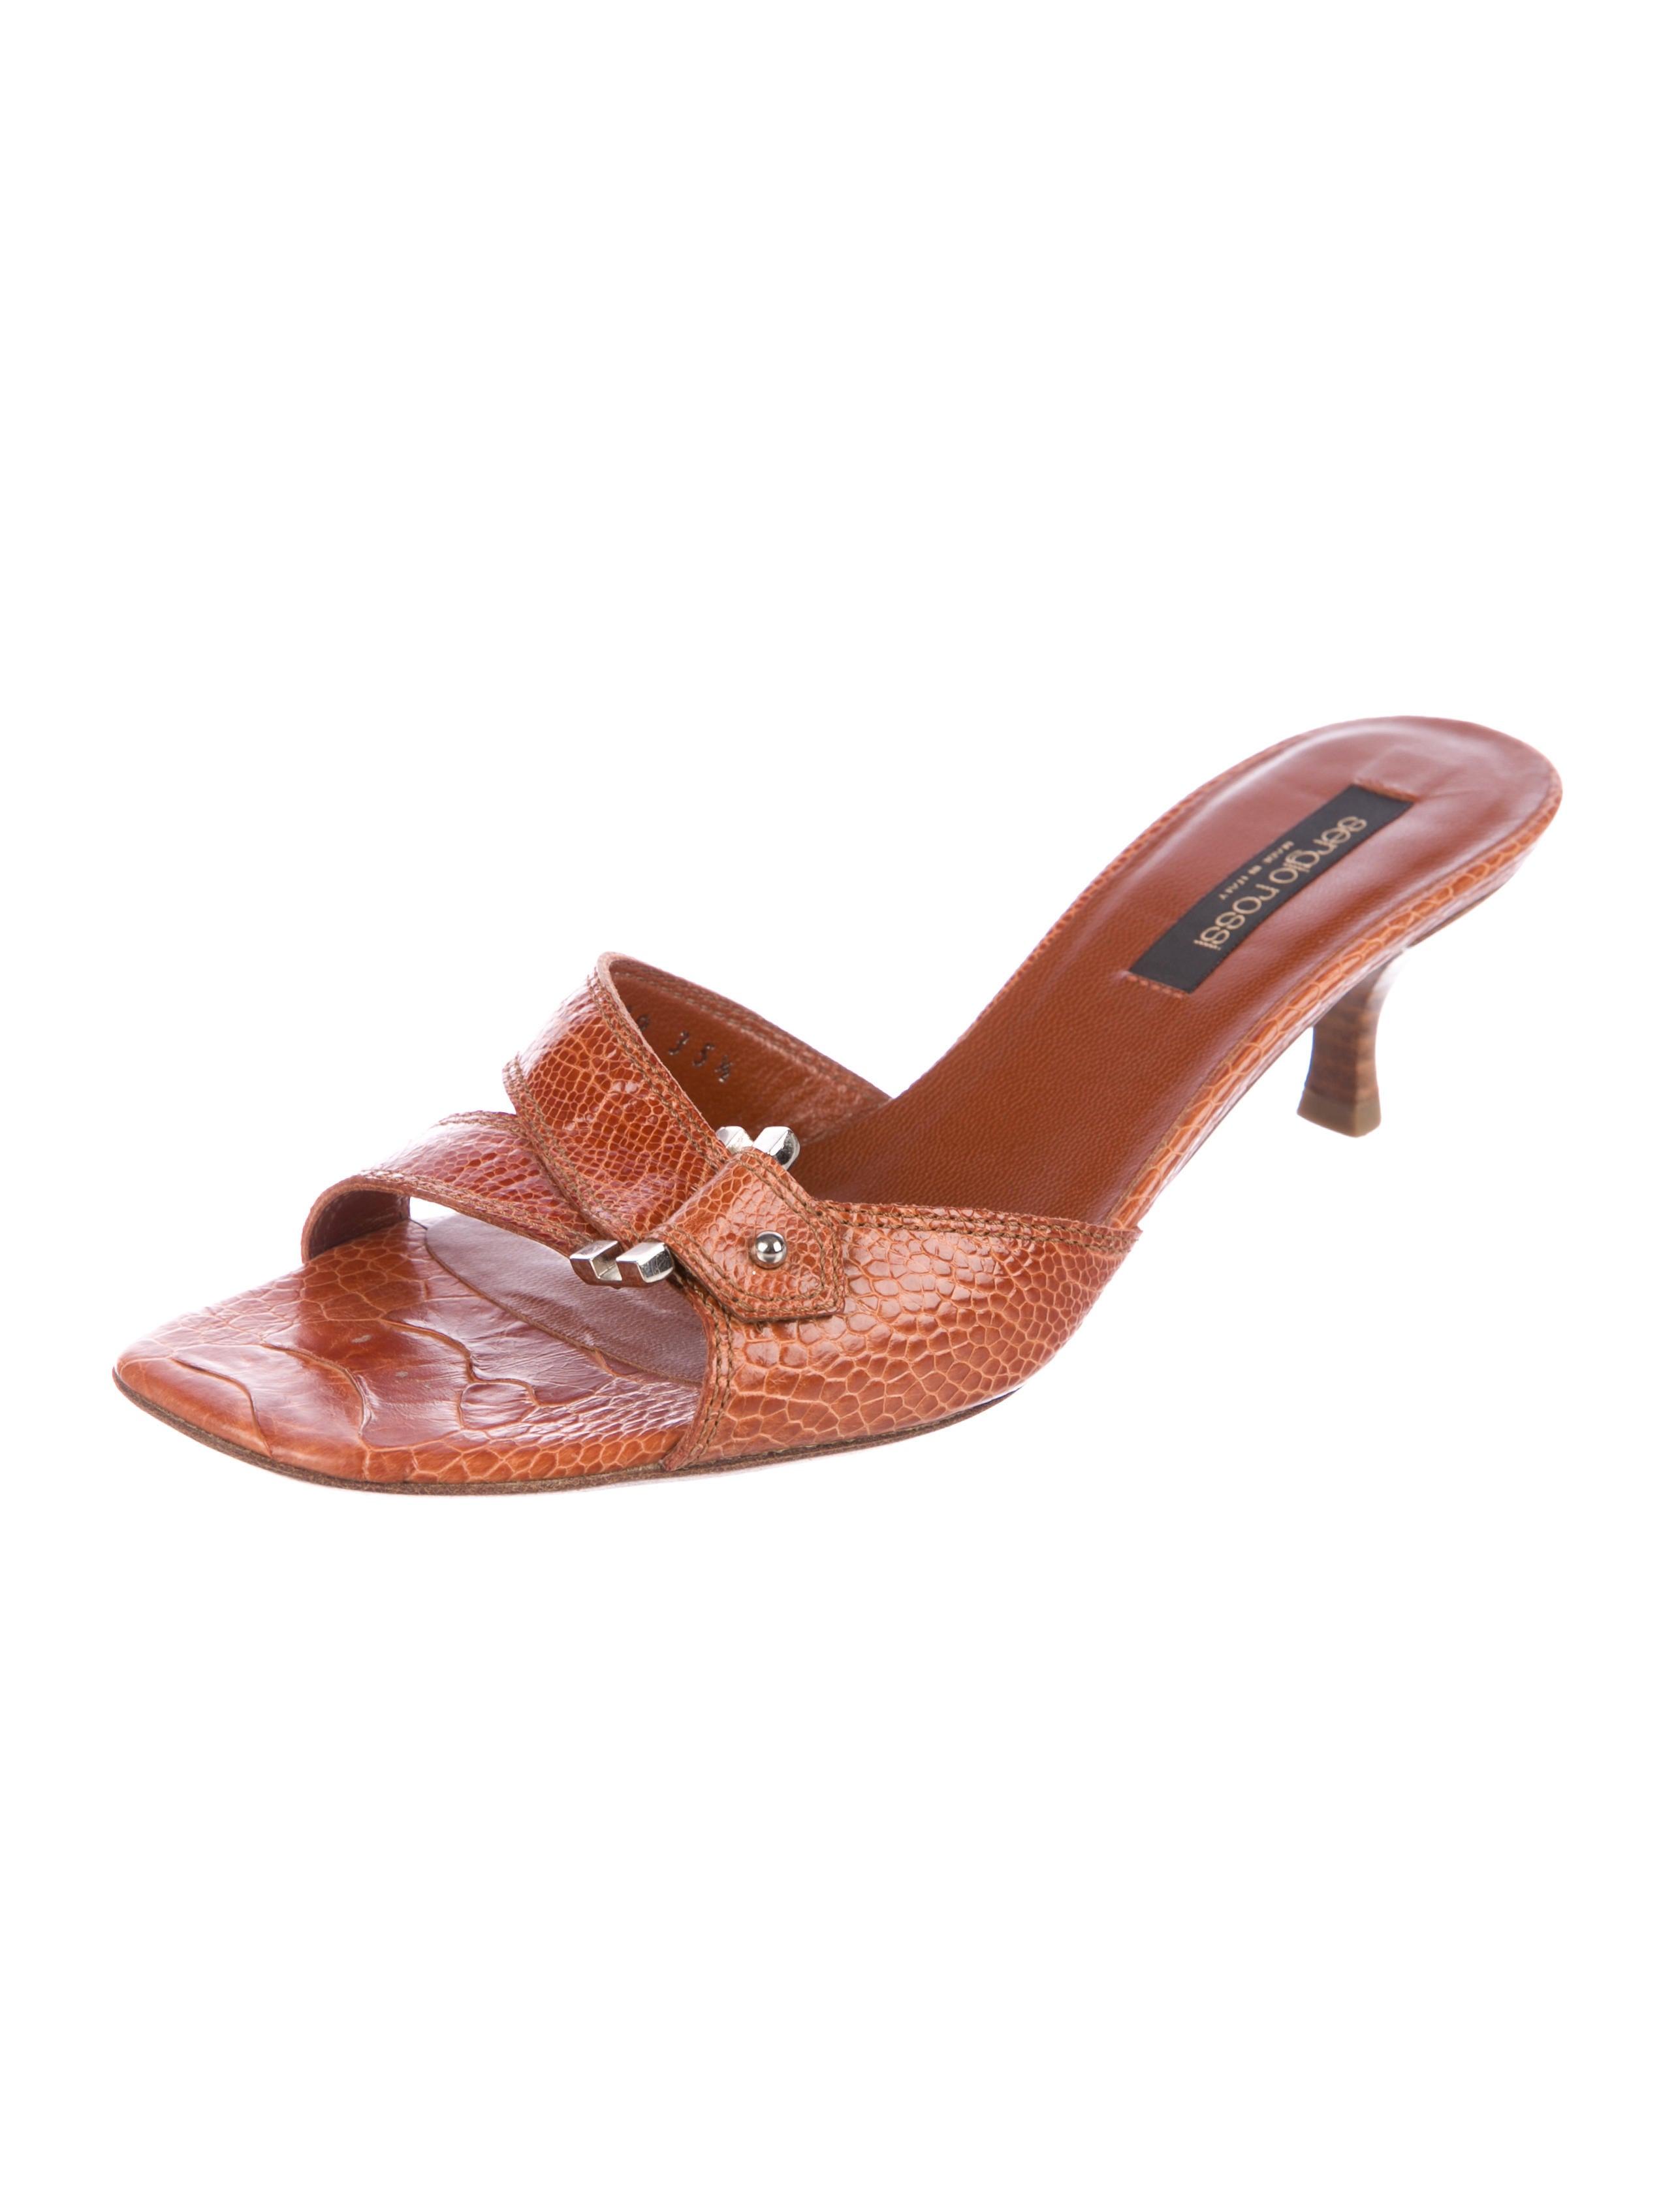 Sergio Rossi Ostrich Leg Slide Sandals free shipping perfect x3v86